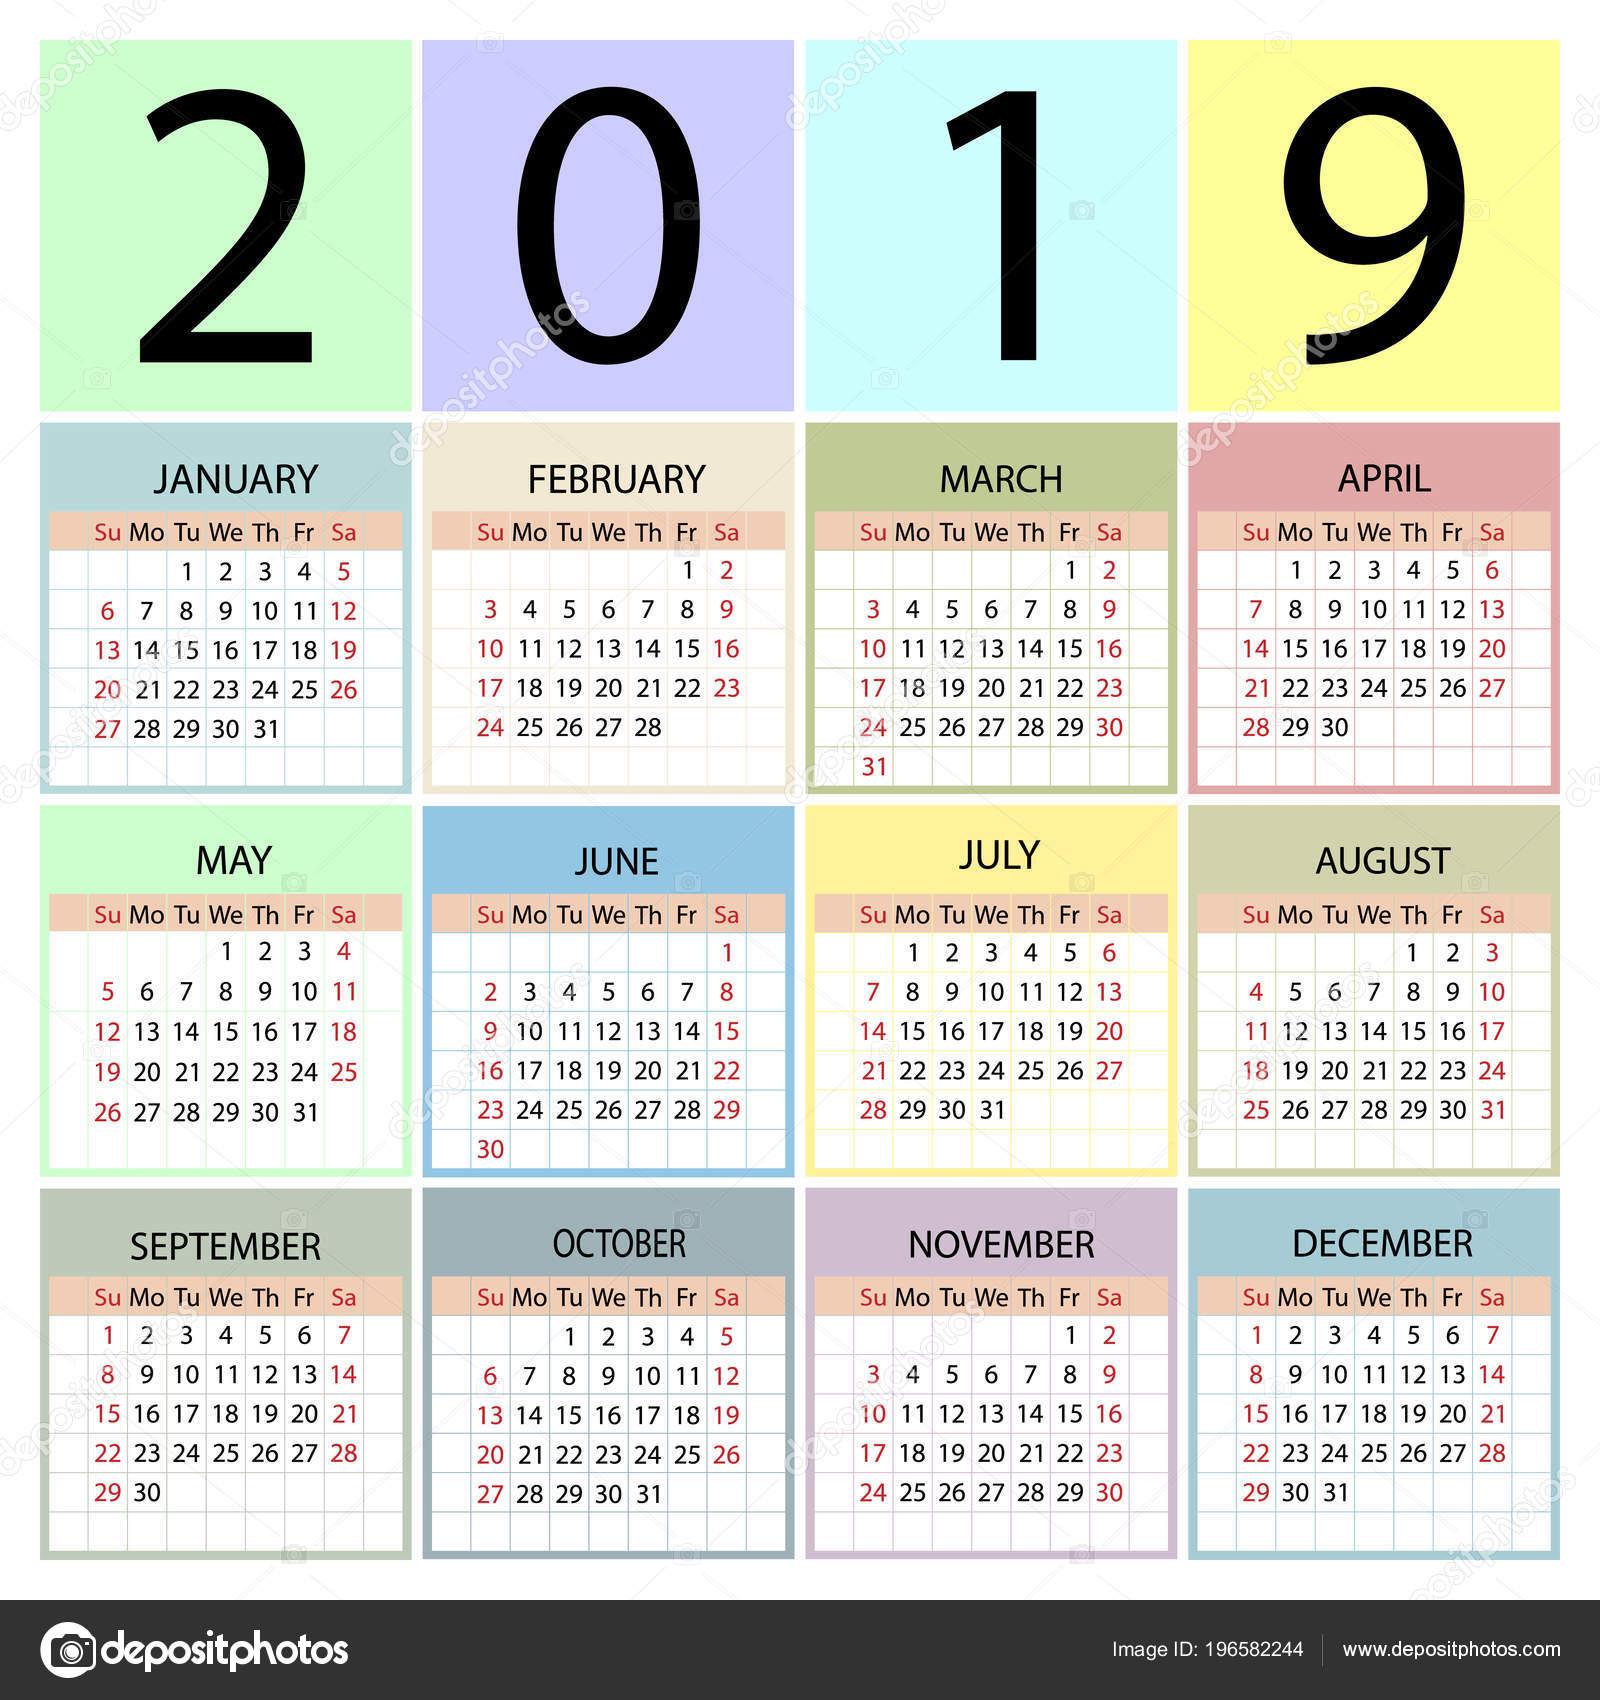 jaar kalender 2019 week begint met zondag stockvector. Black Bedroom Furniture Sets. Home Design Ideas